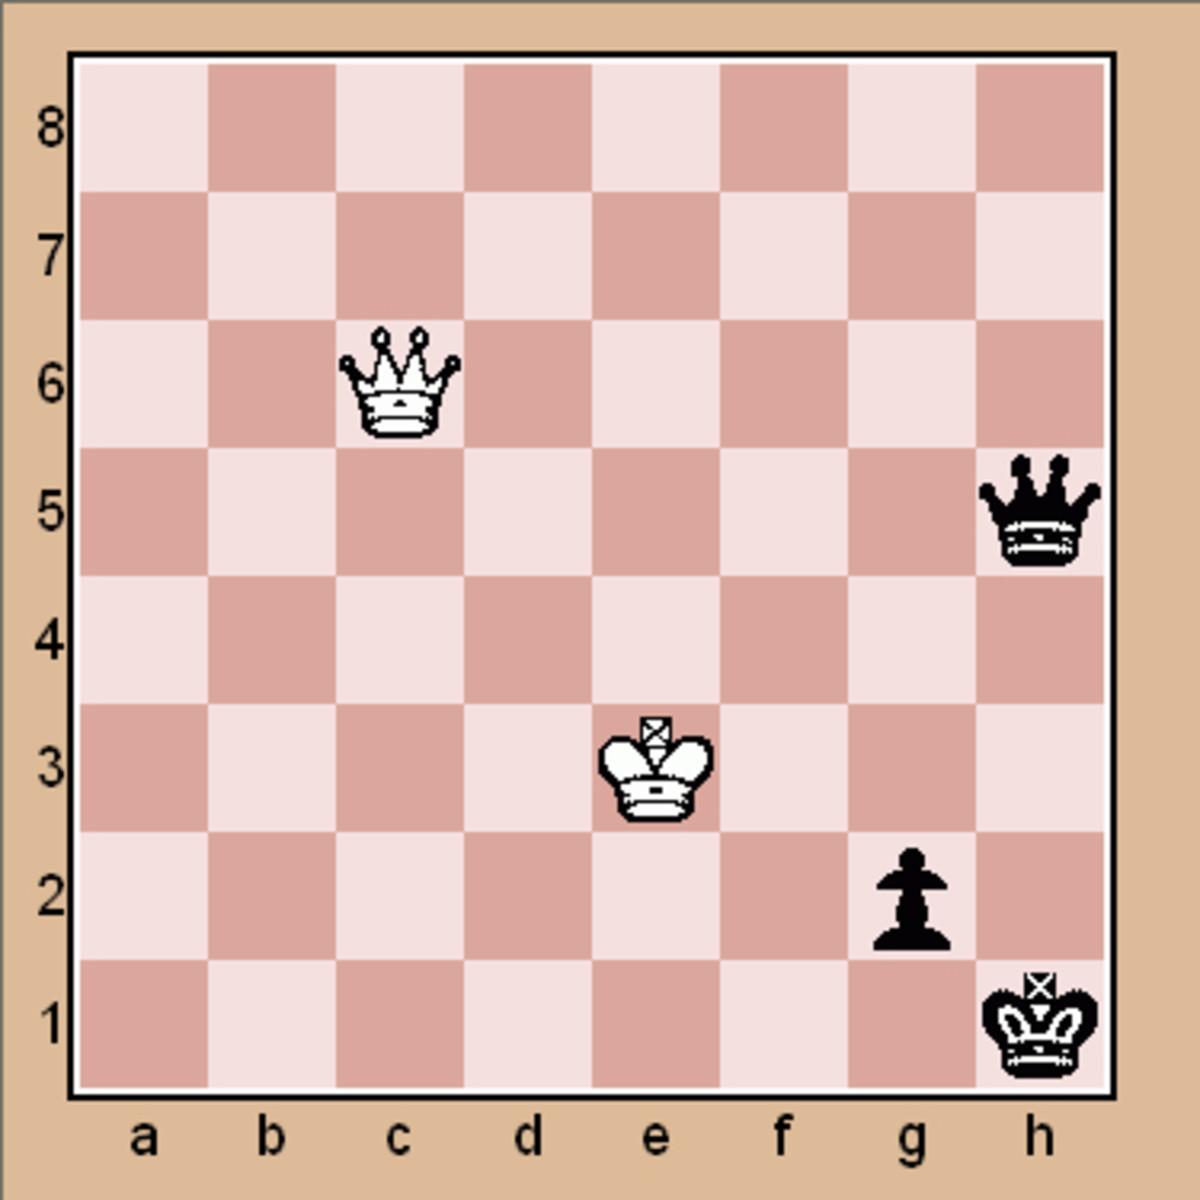 Endgame Chess Puzzles